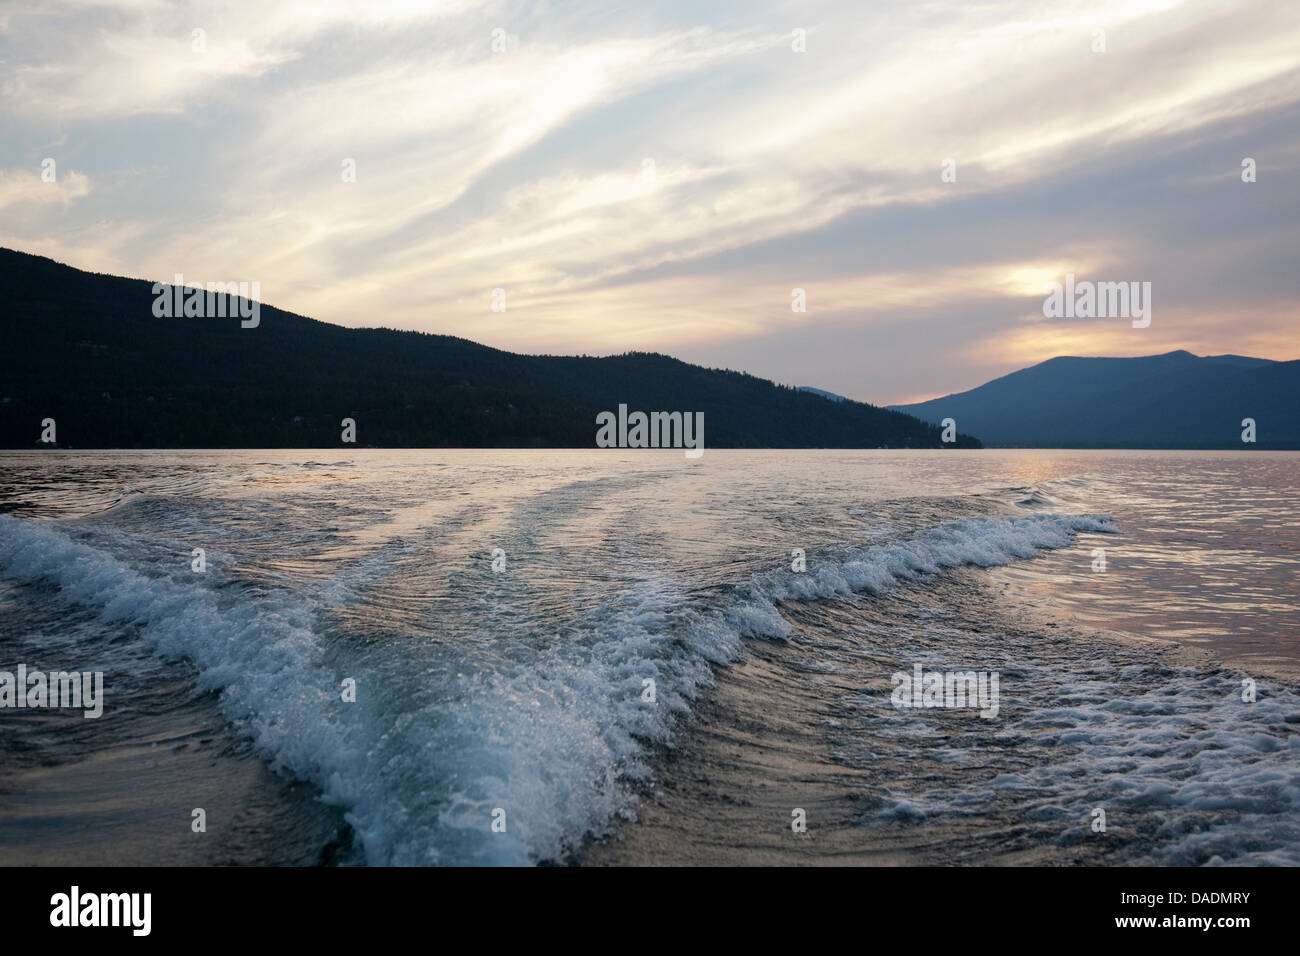 Waves, Lake Pend Oreille, Idaho, USA - Stock Image